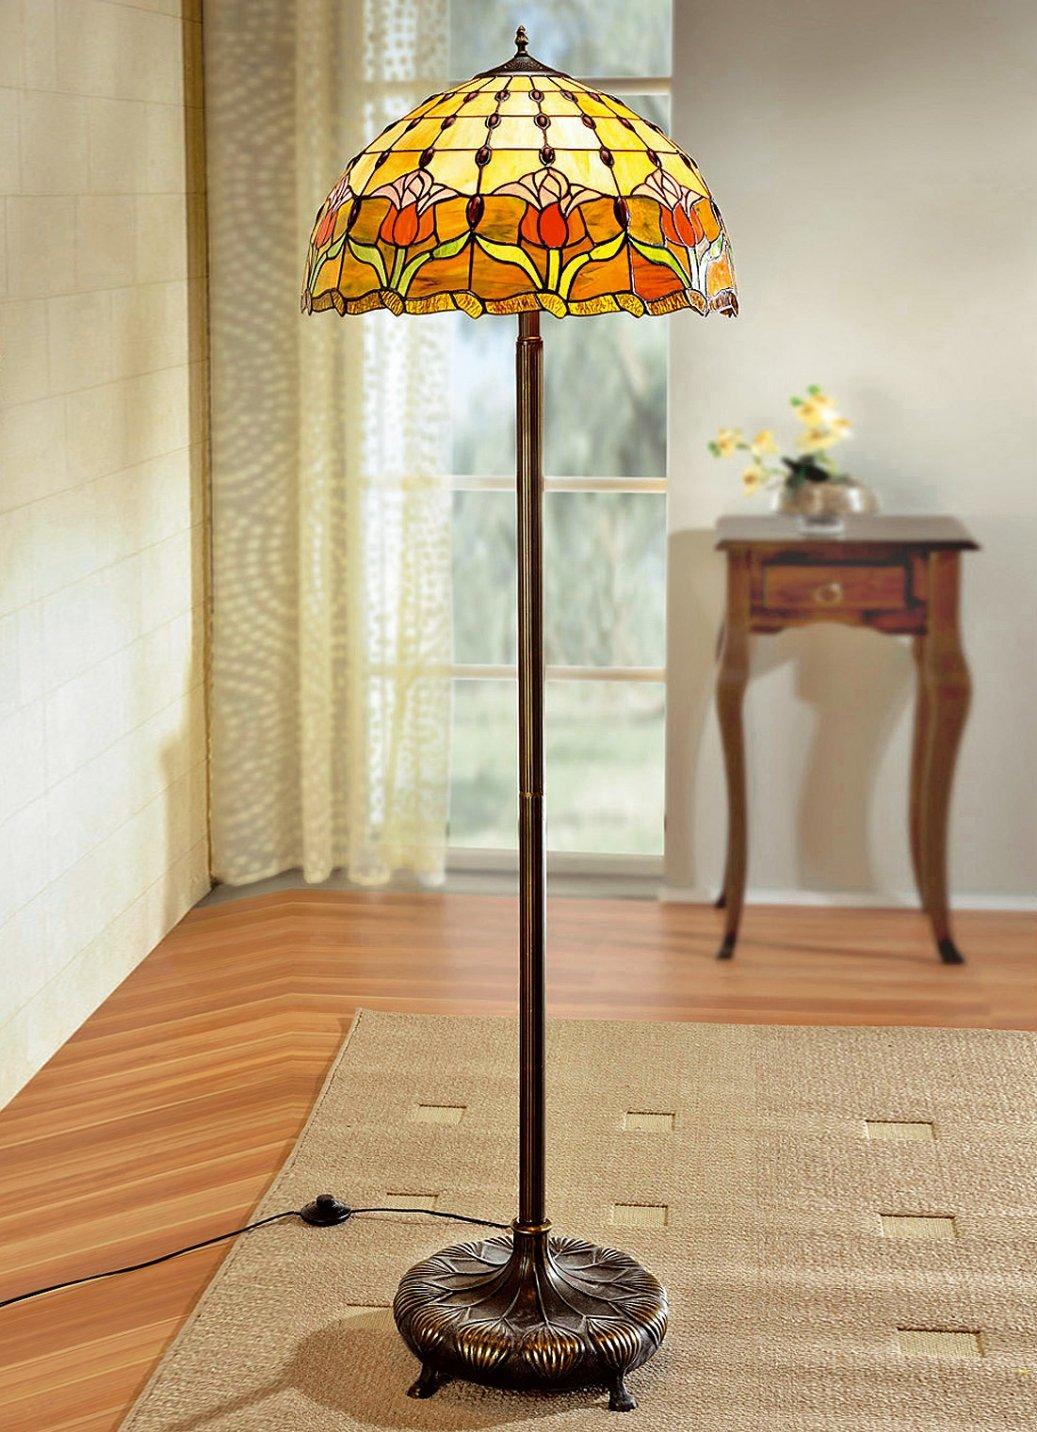 tiffany optik stil stehlampe stehleuchte lampe licht standleuchte dekoration ebay. Black Bedroom Furniture Sets. Home Design Ideas